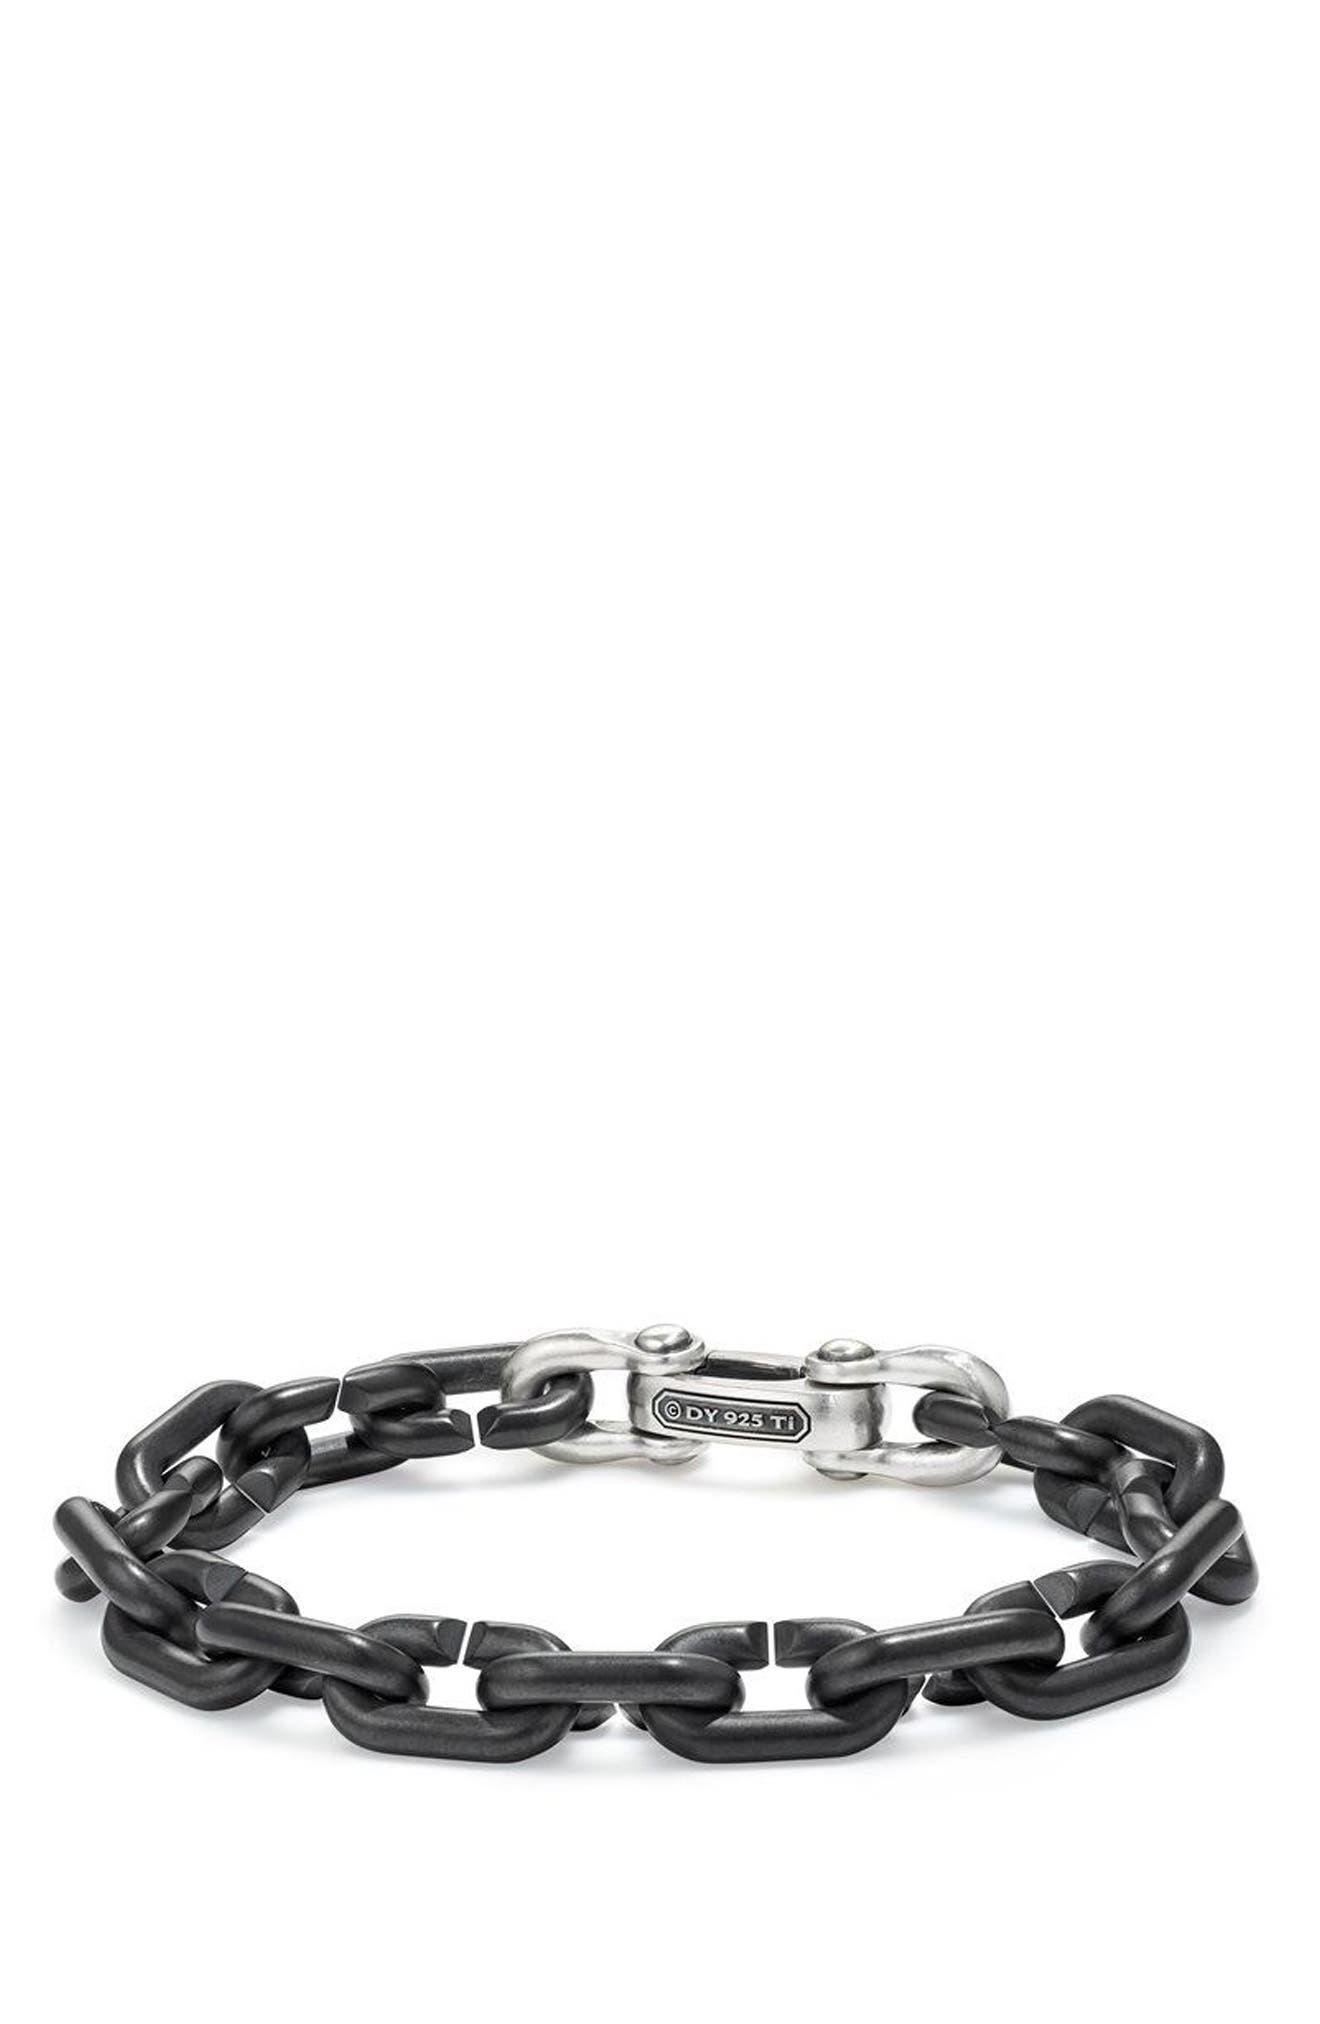 David Yurman Bold Chain Links Bracelet